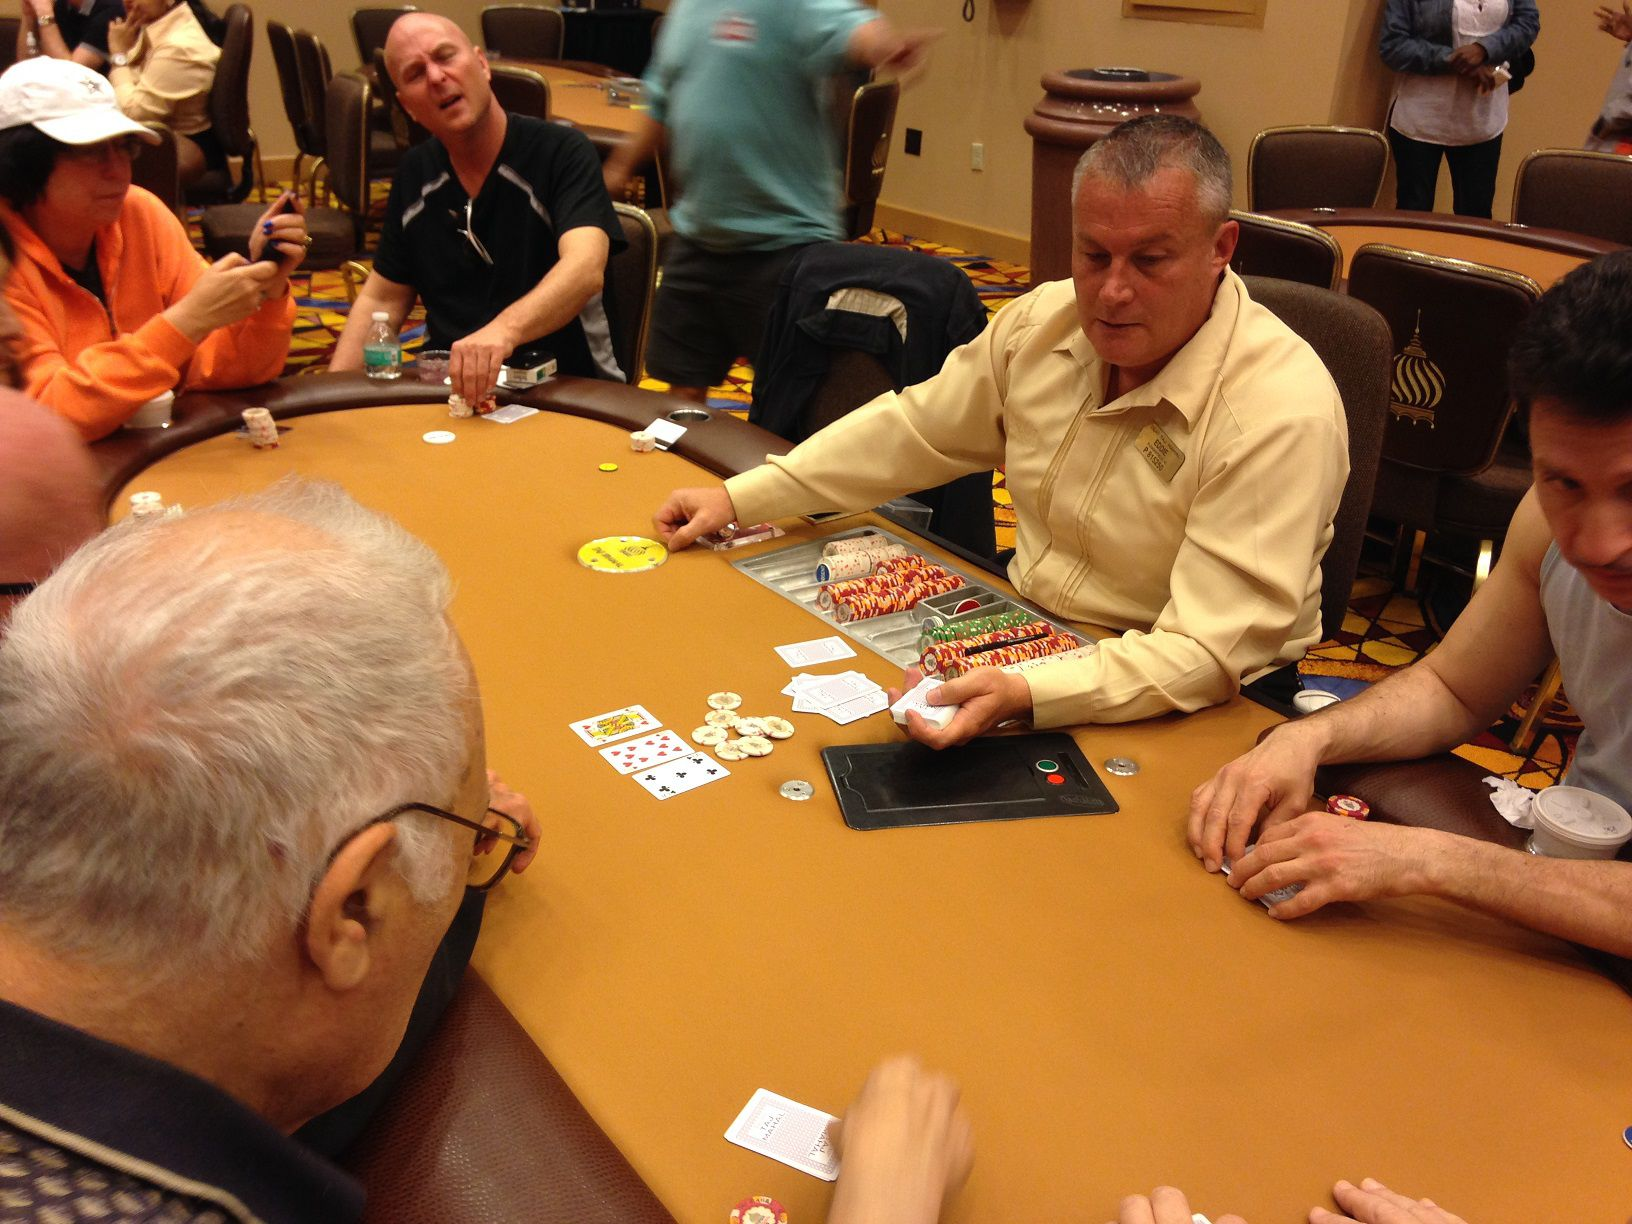 Ocean city casino poker show tickets at grand casino